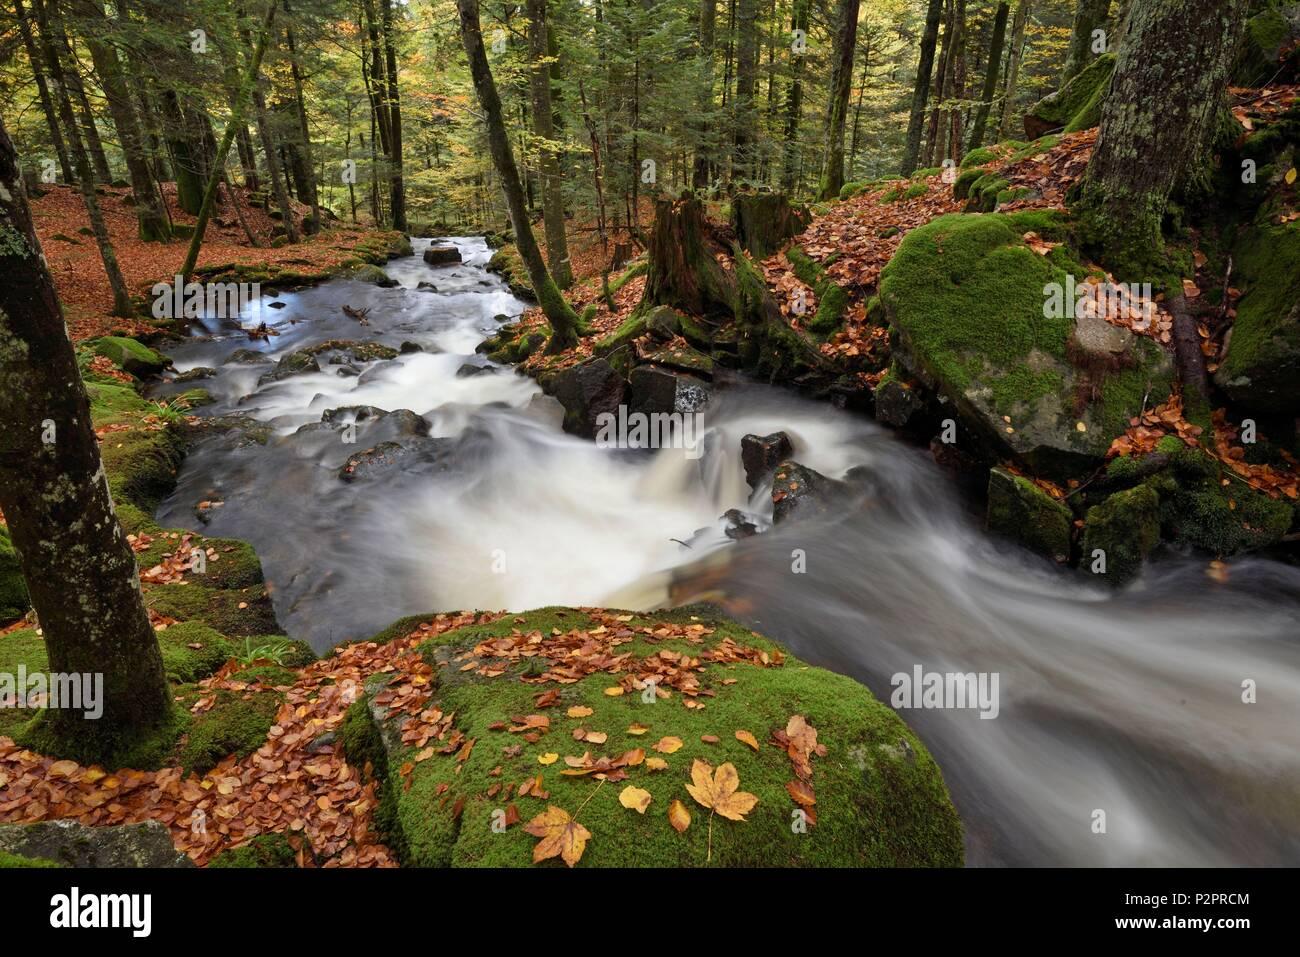 France, Territoire de Belfort, Ballon d Alsace, forest, La Savoureuse river, Rummel waterfall - Stock Image